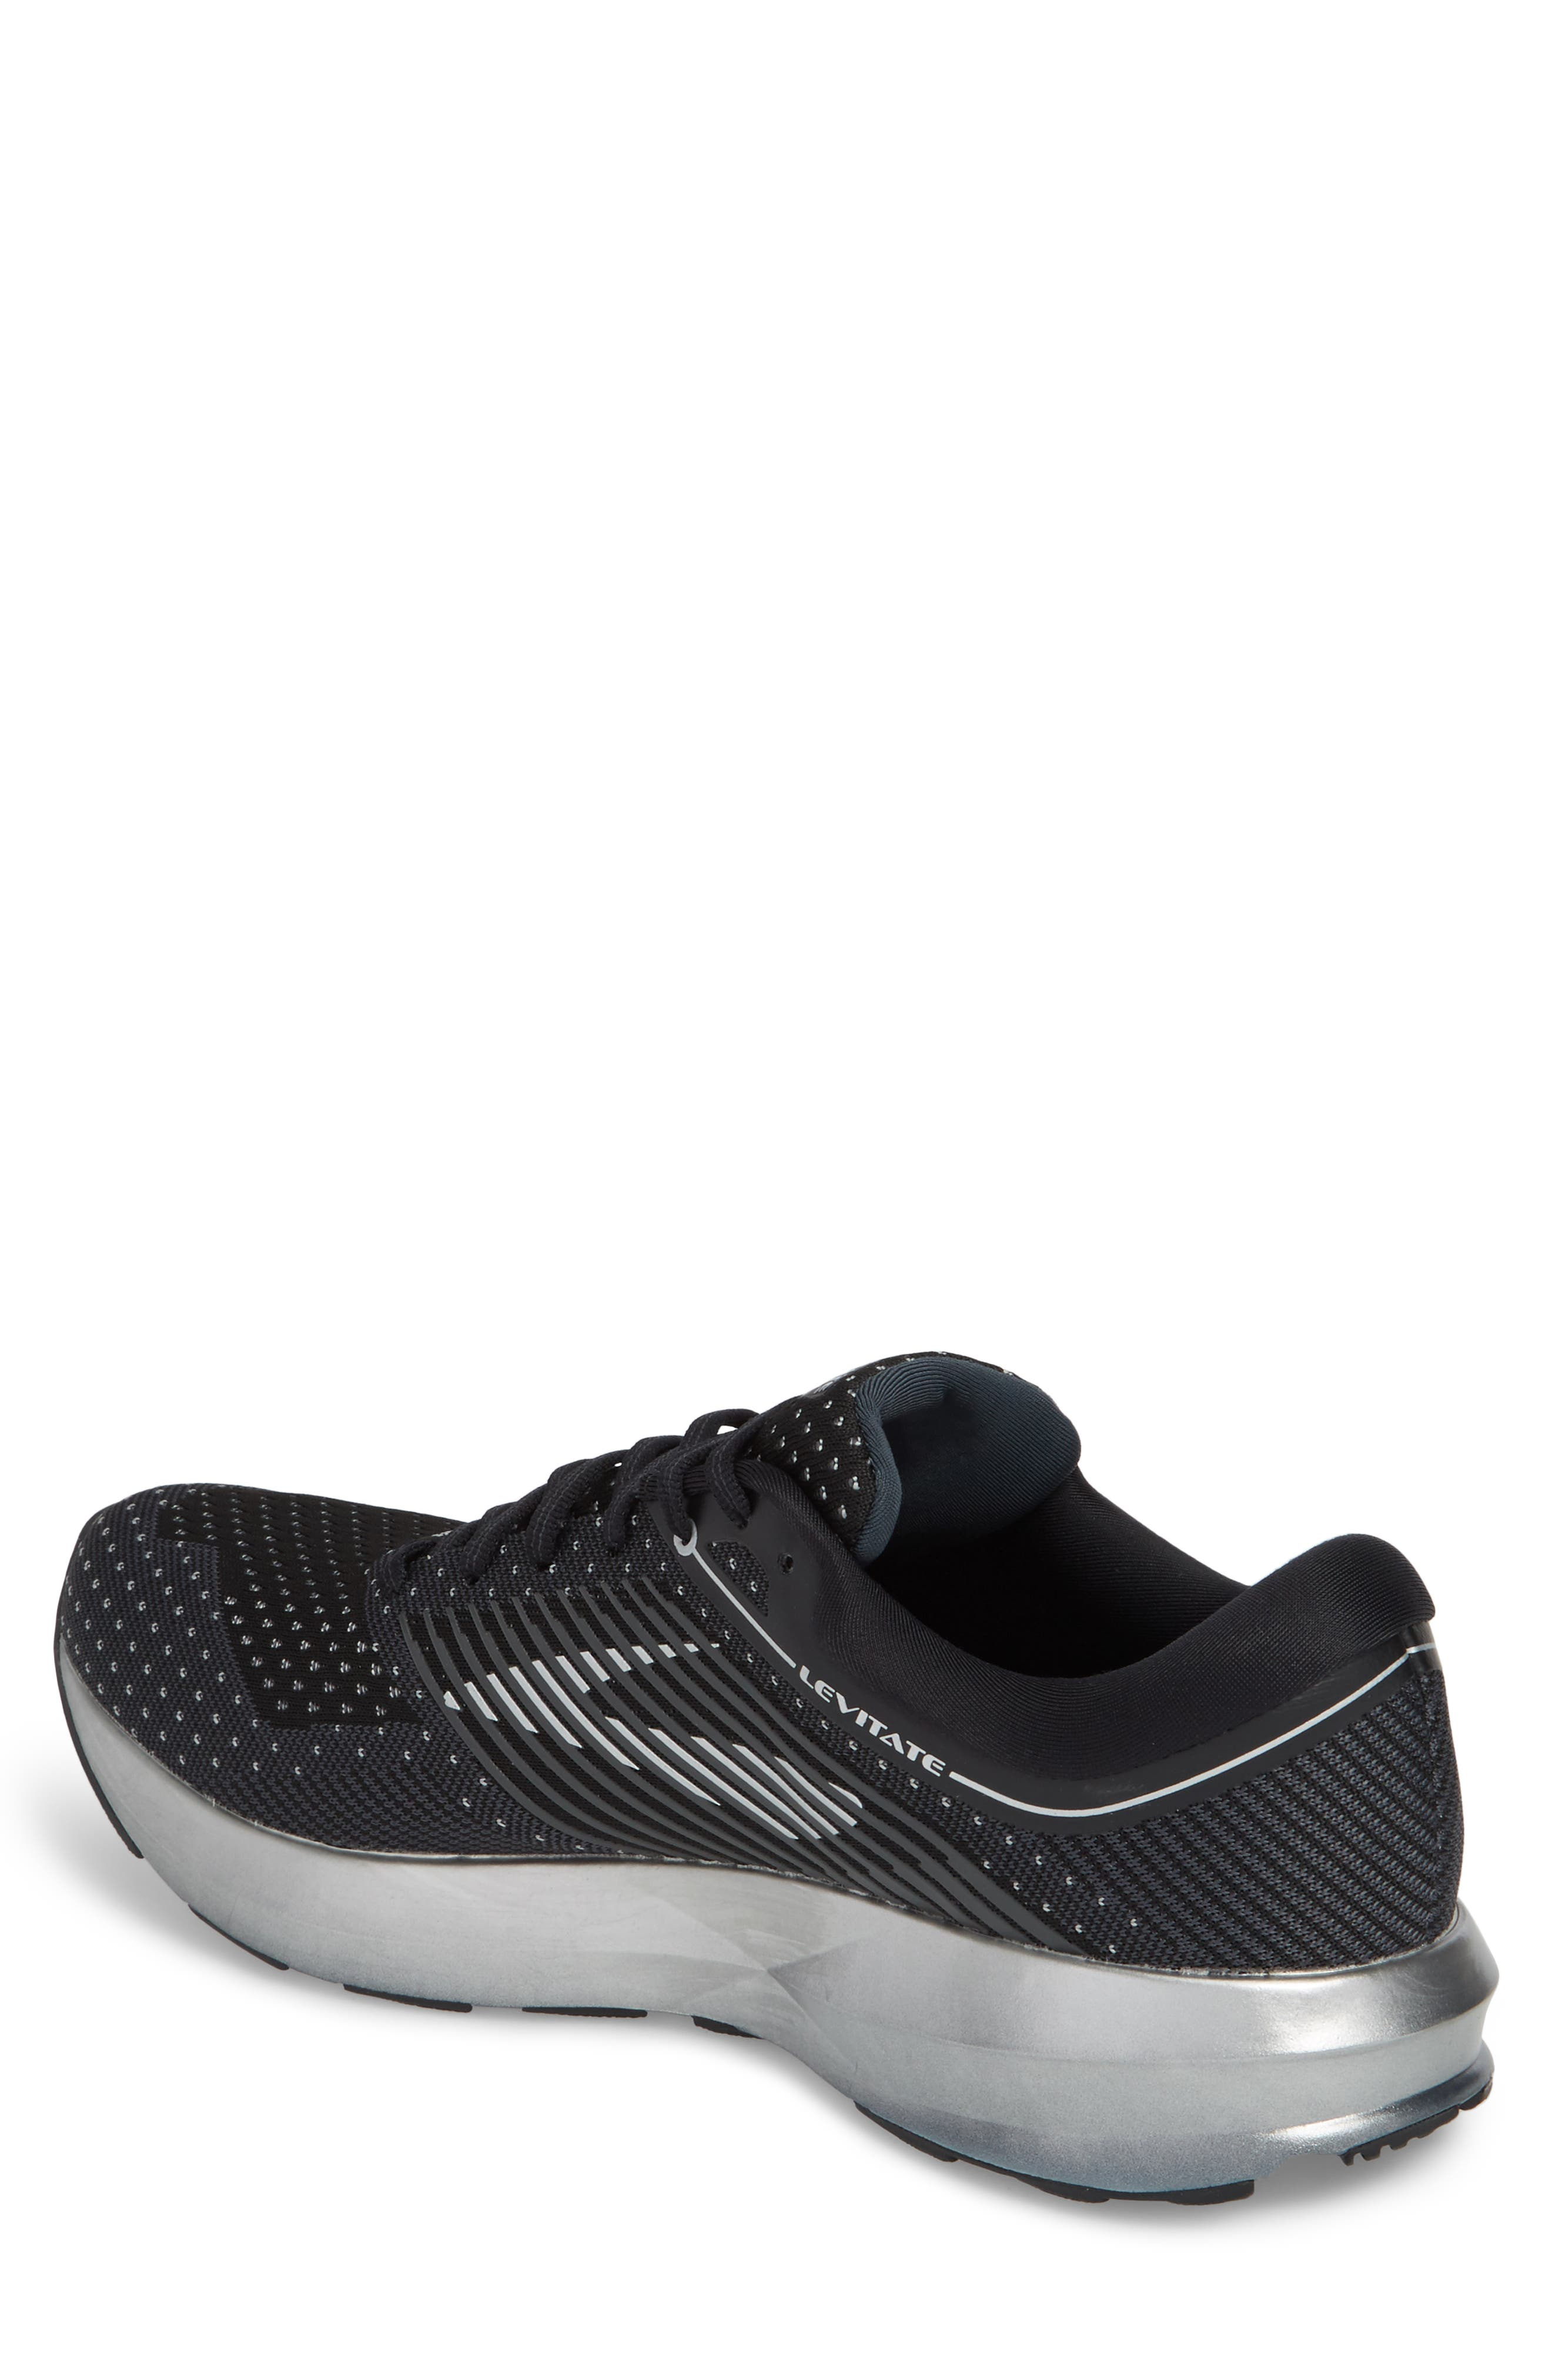 Levitate Running Shoe,                             Alternate thumbnail 2, color,                             004